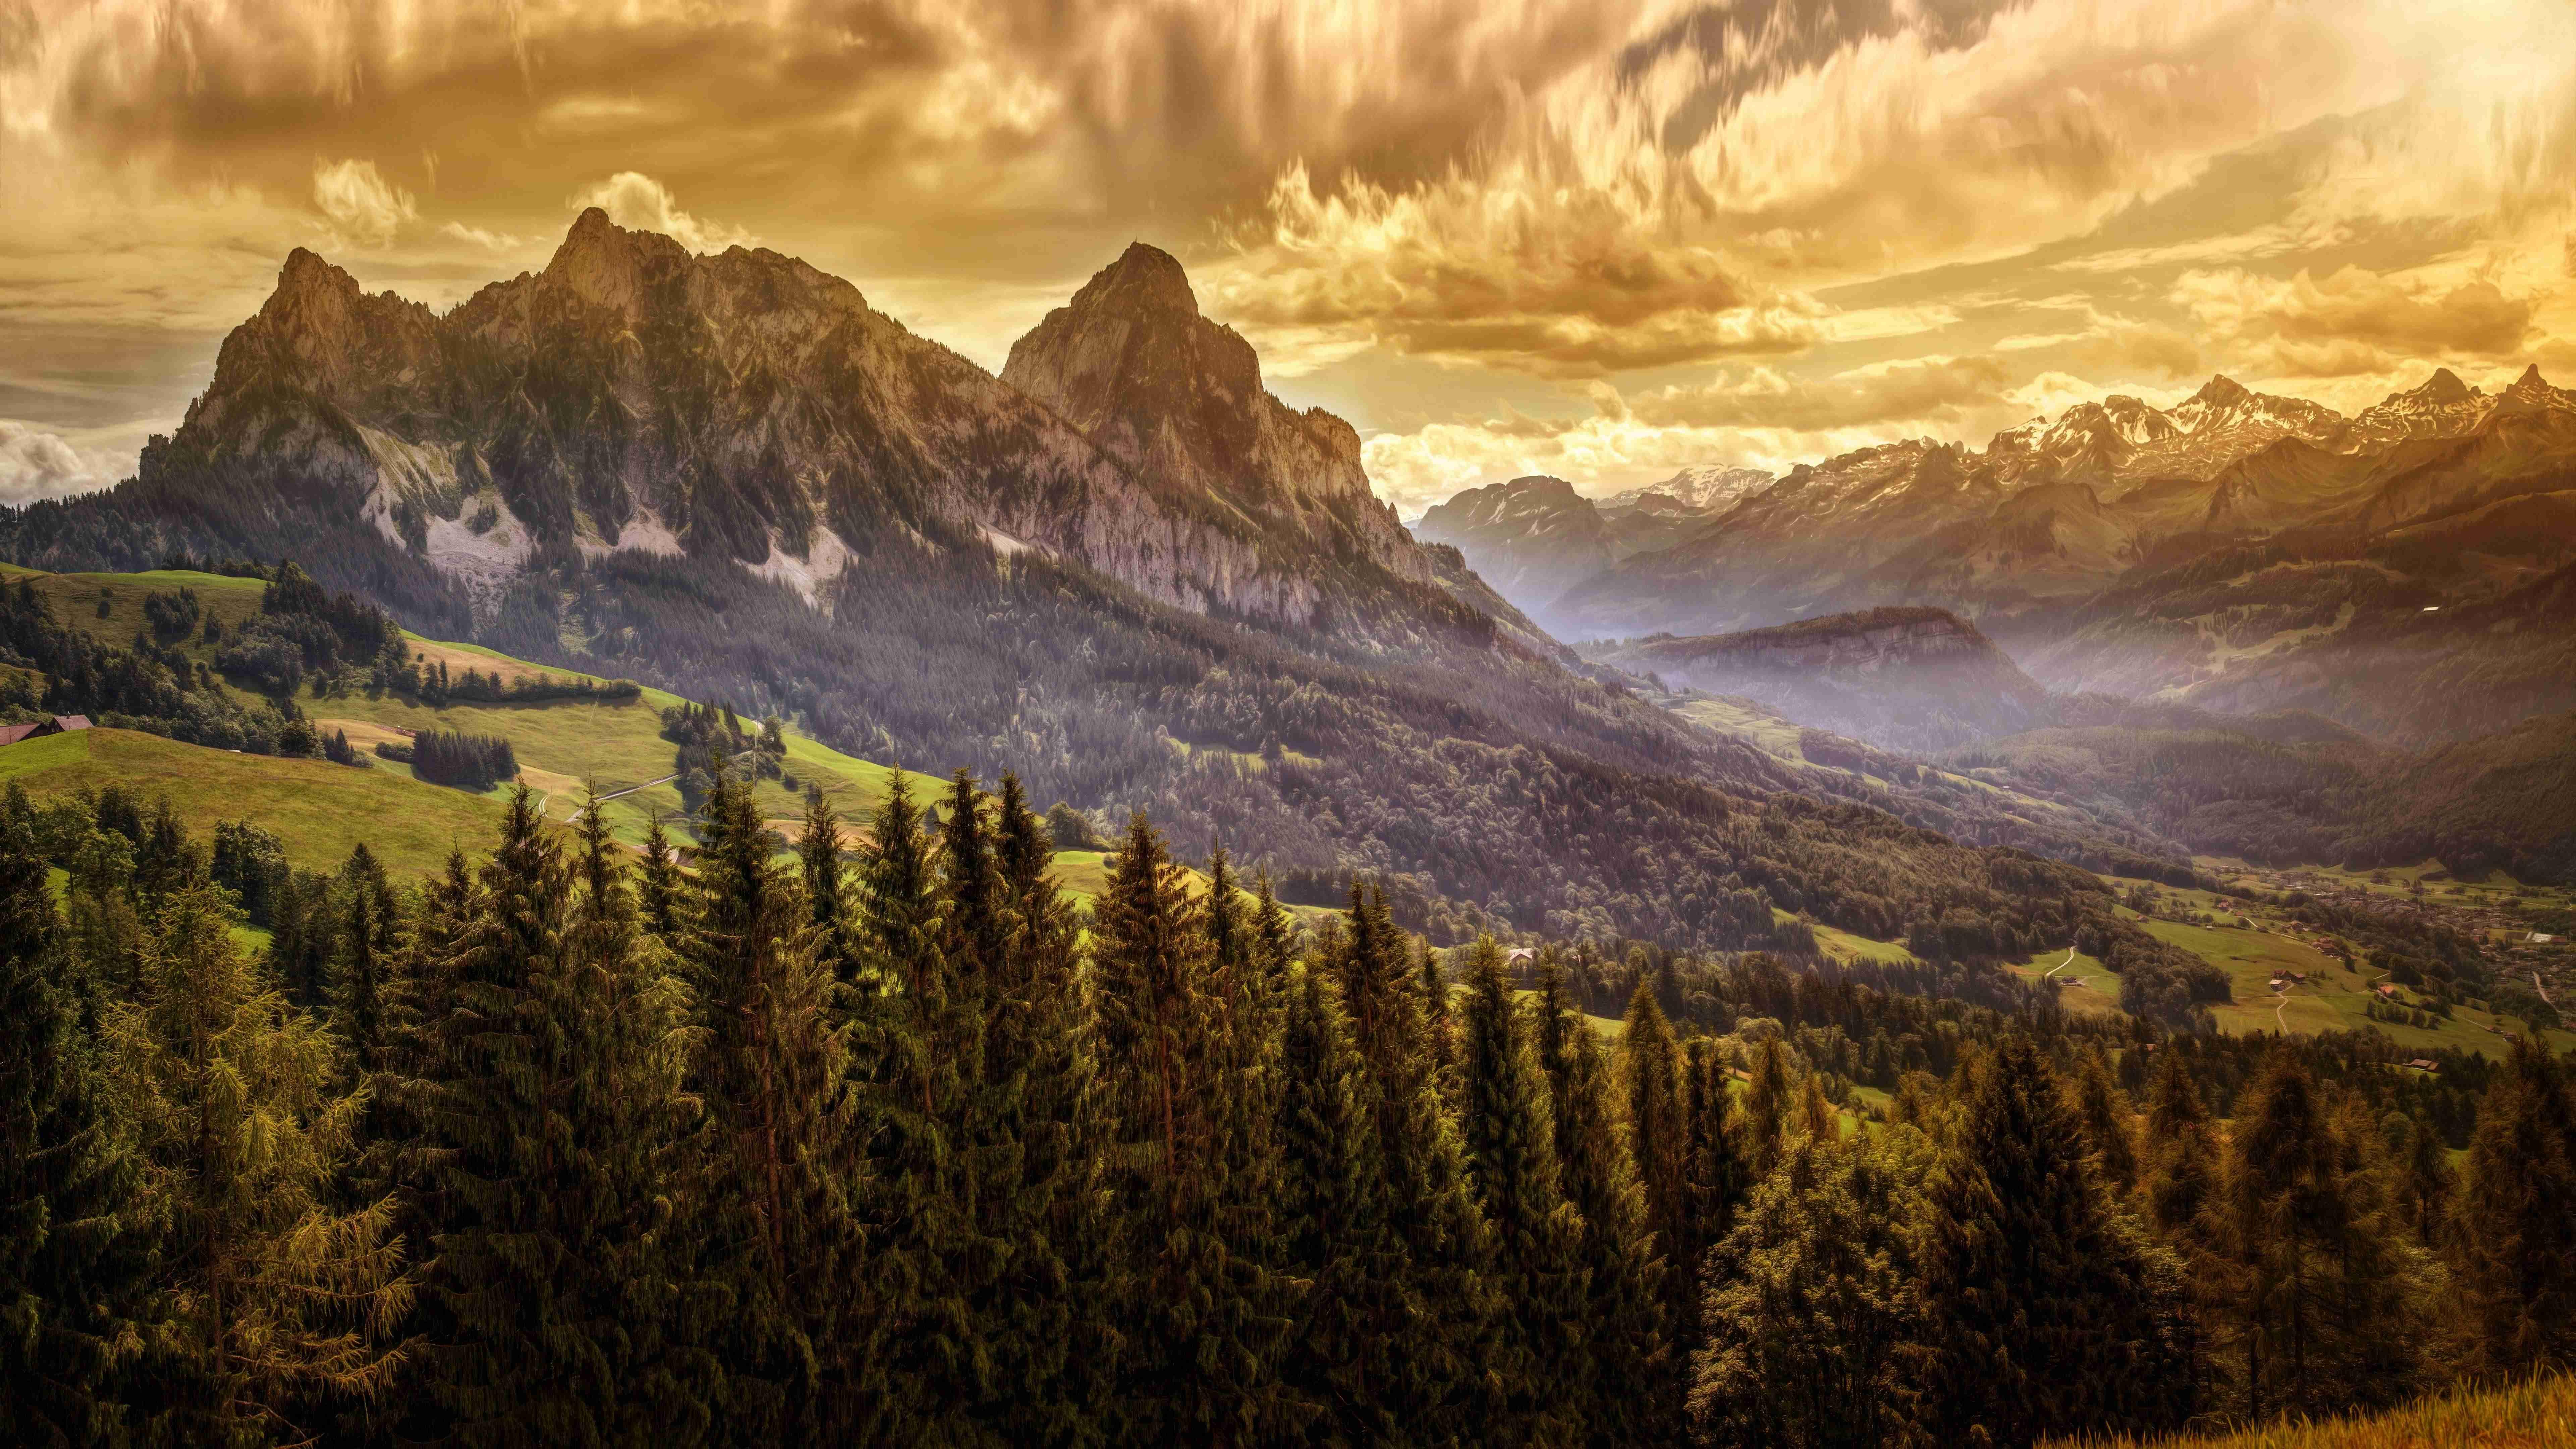 8k Animal Wallpaper Download: Top Free Nature 8K Backgrounds